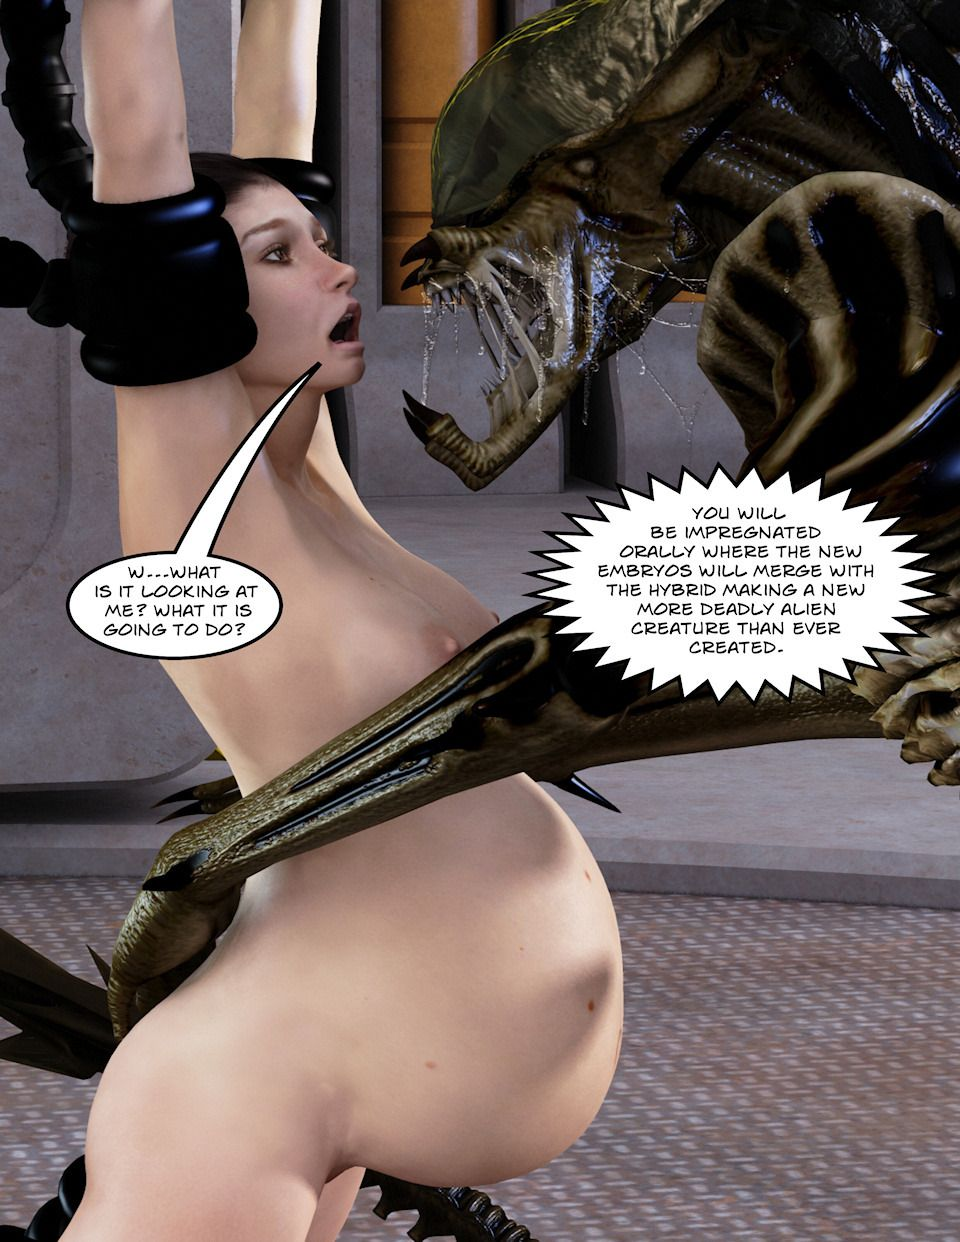 Alien Impregnation Toons - Impregnated alien. Sex HD photos 100% free. Comments: 2